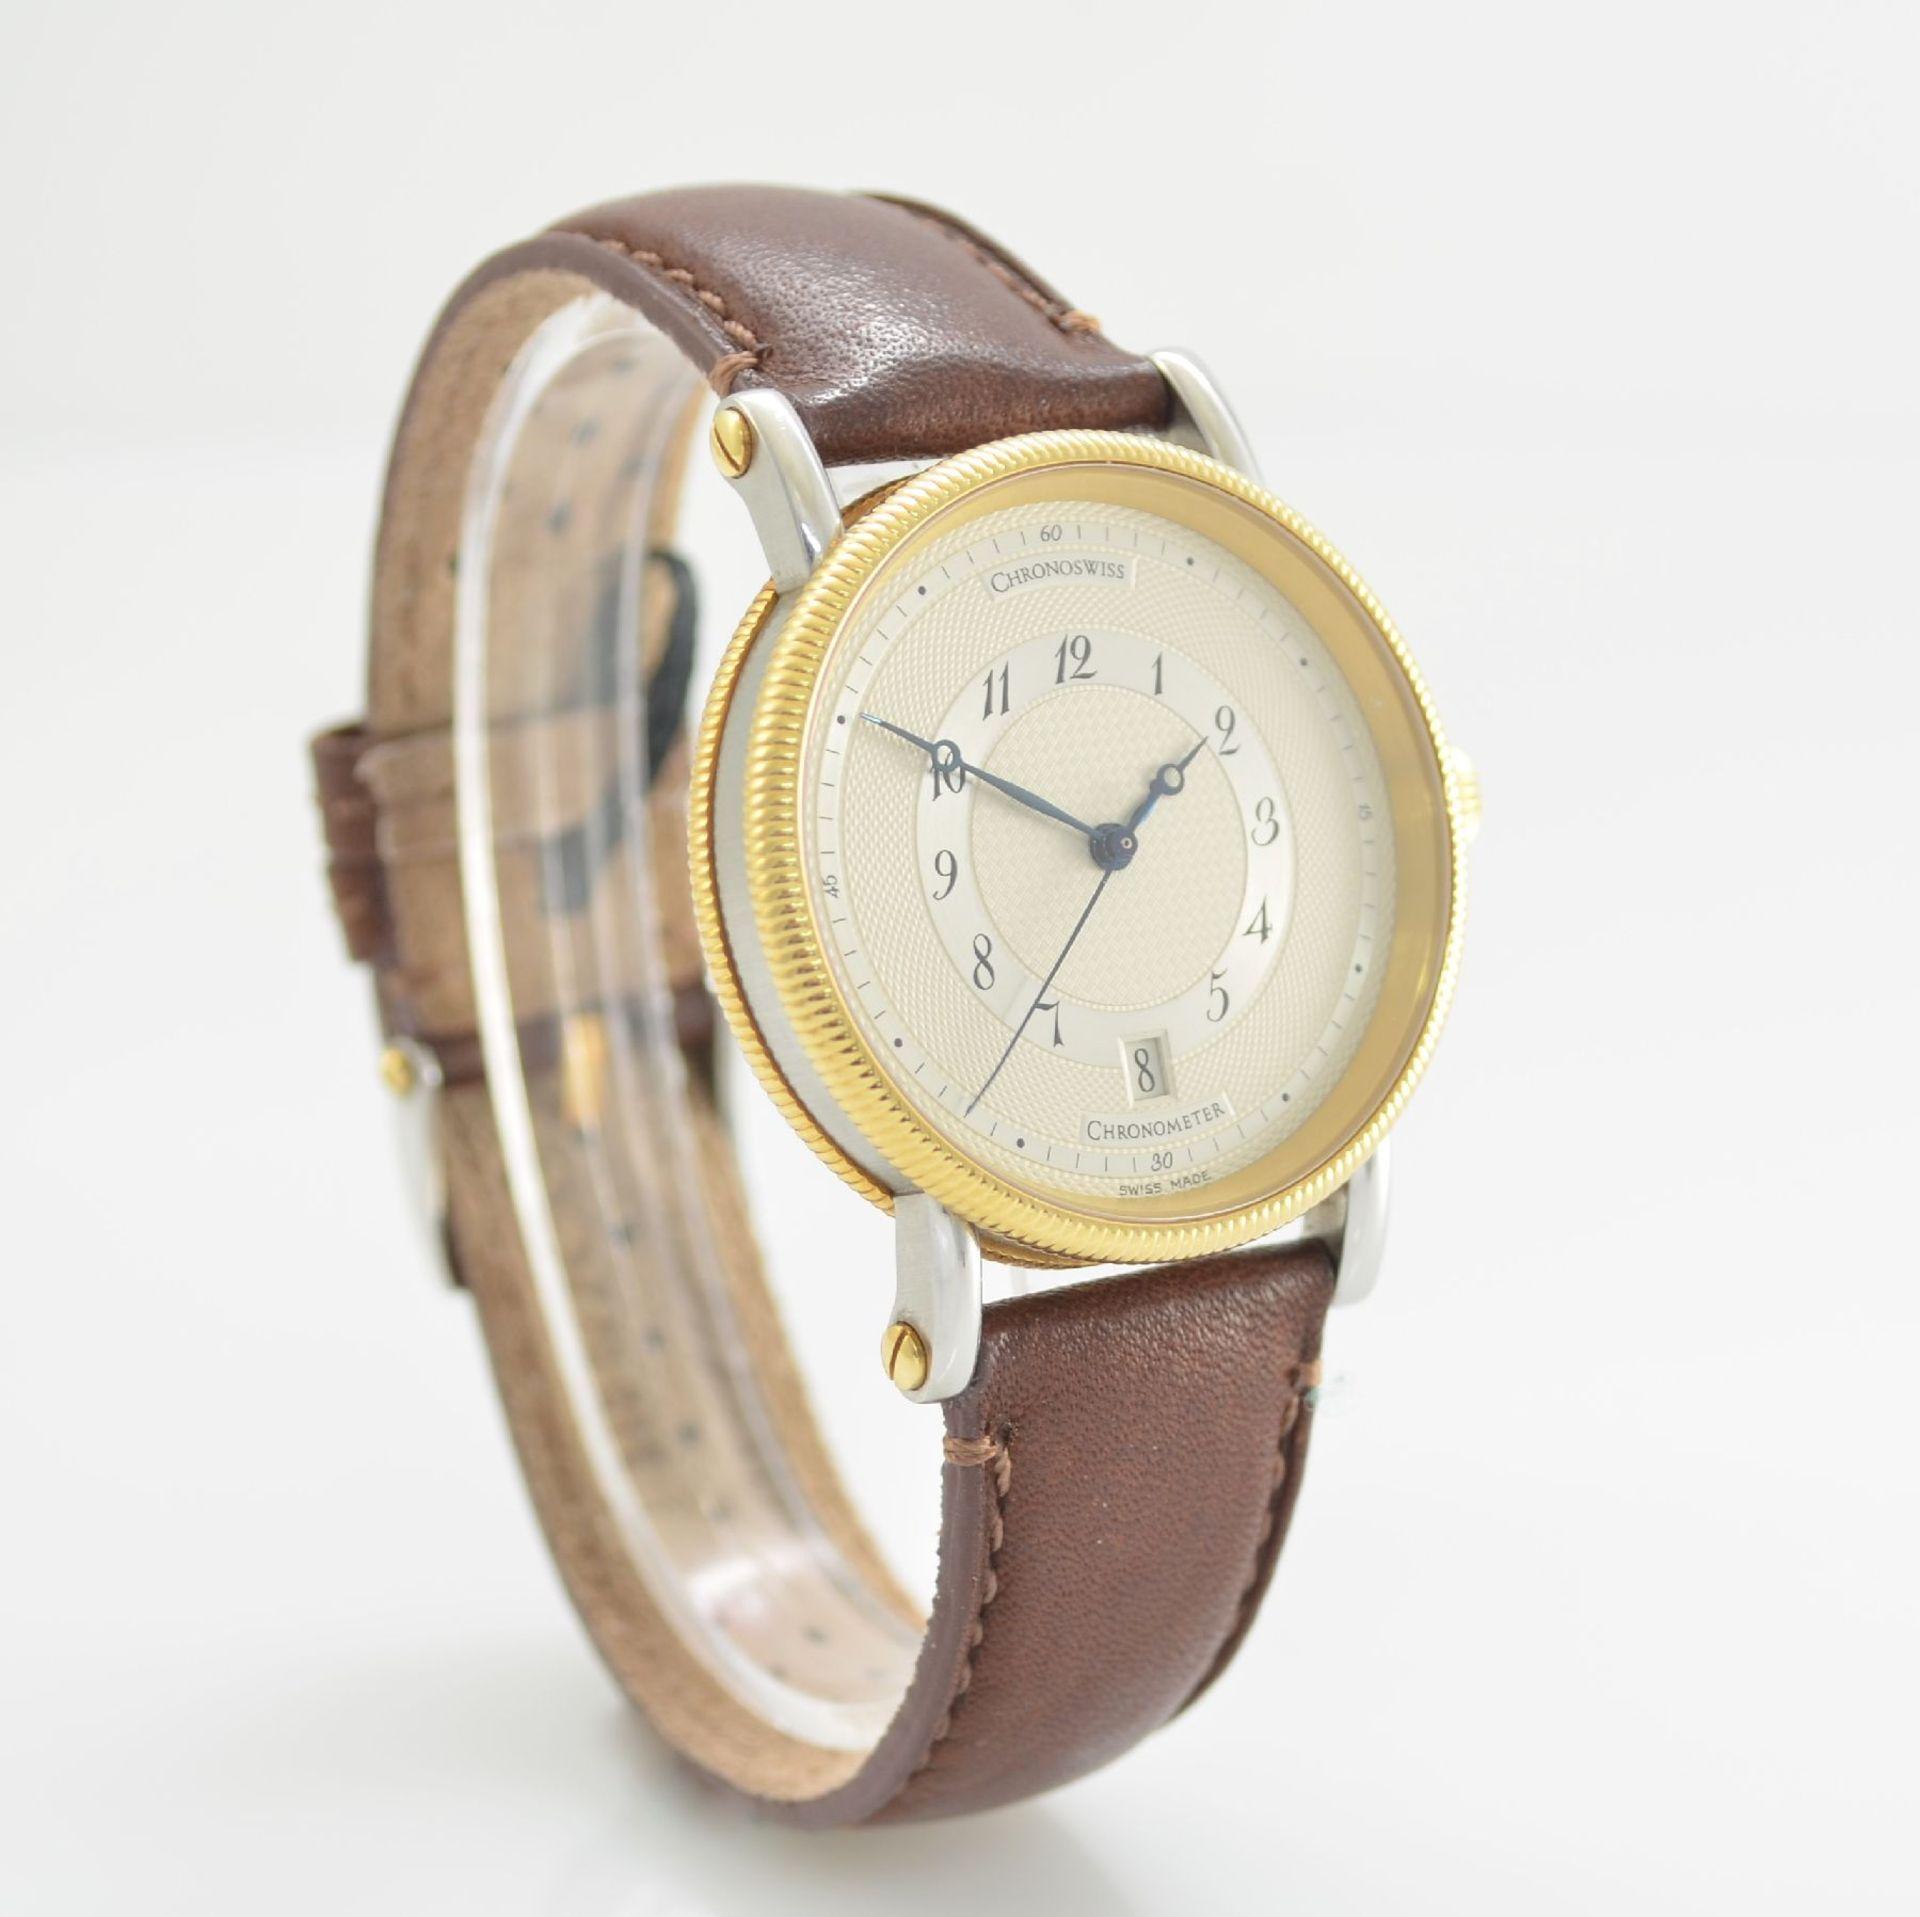 CHRONOSWISS Chronometer Herrenarmbanduhr, Automatik, Ref. CH 2822, Edelstahl/Gold kombiniert inkl. - Bild 4 aus 7